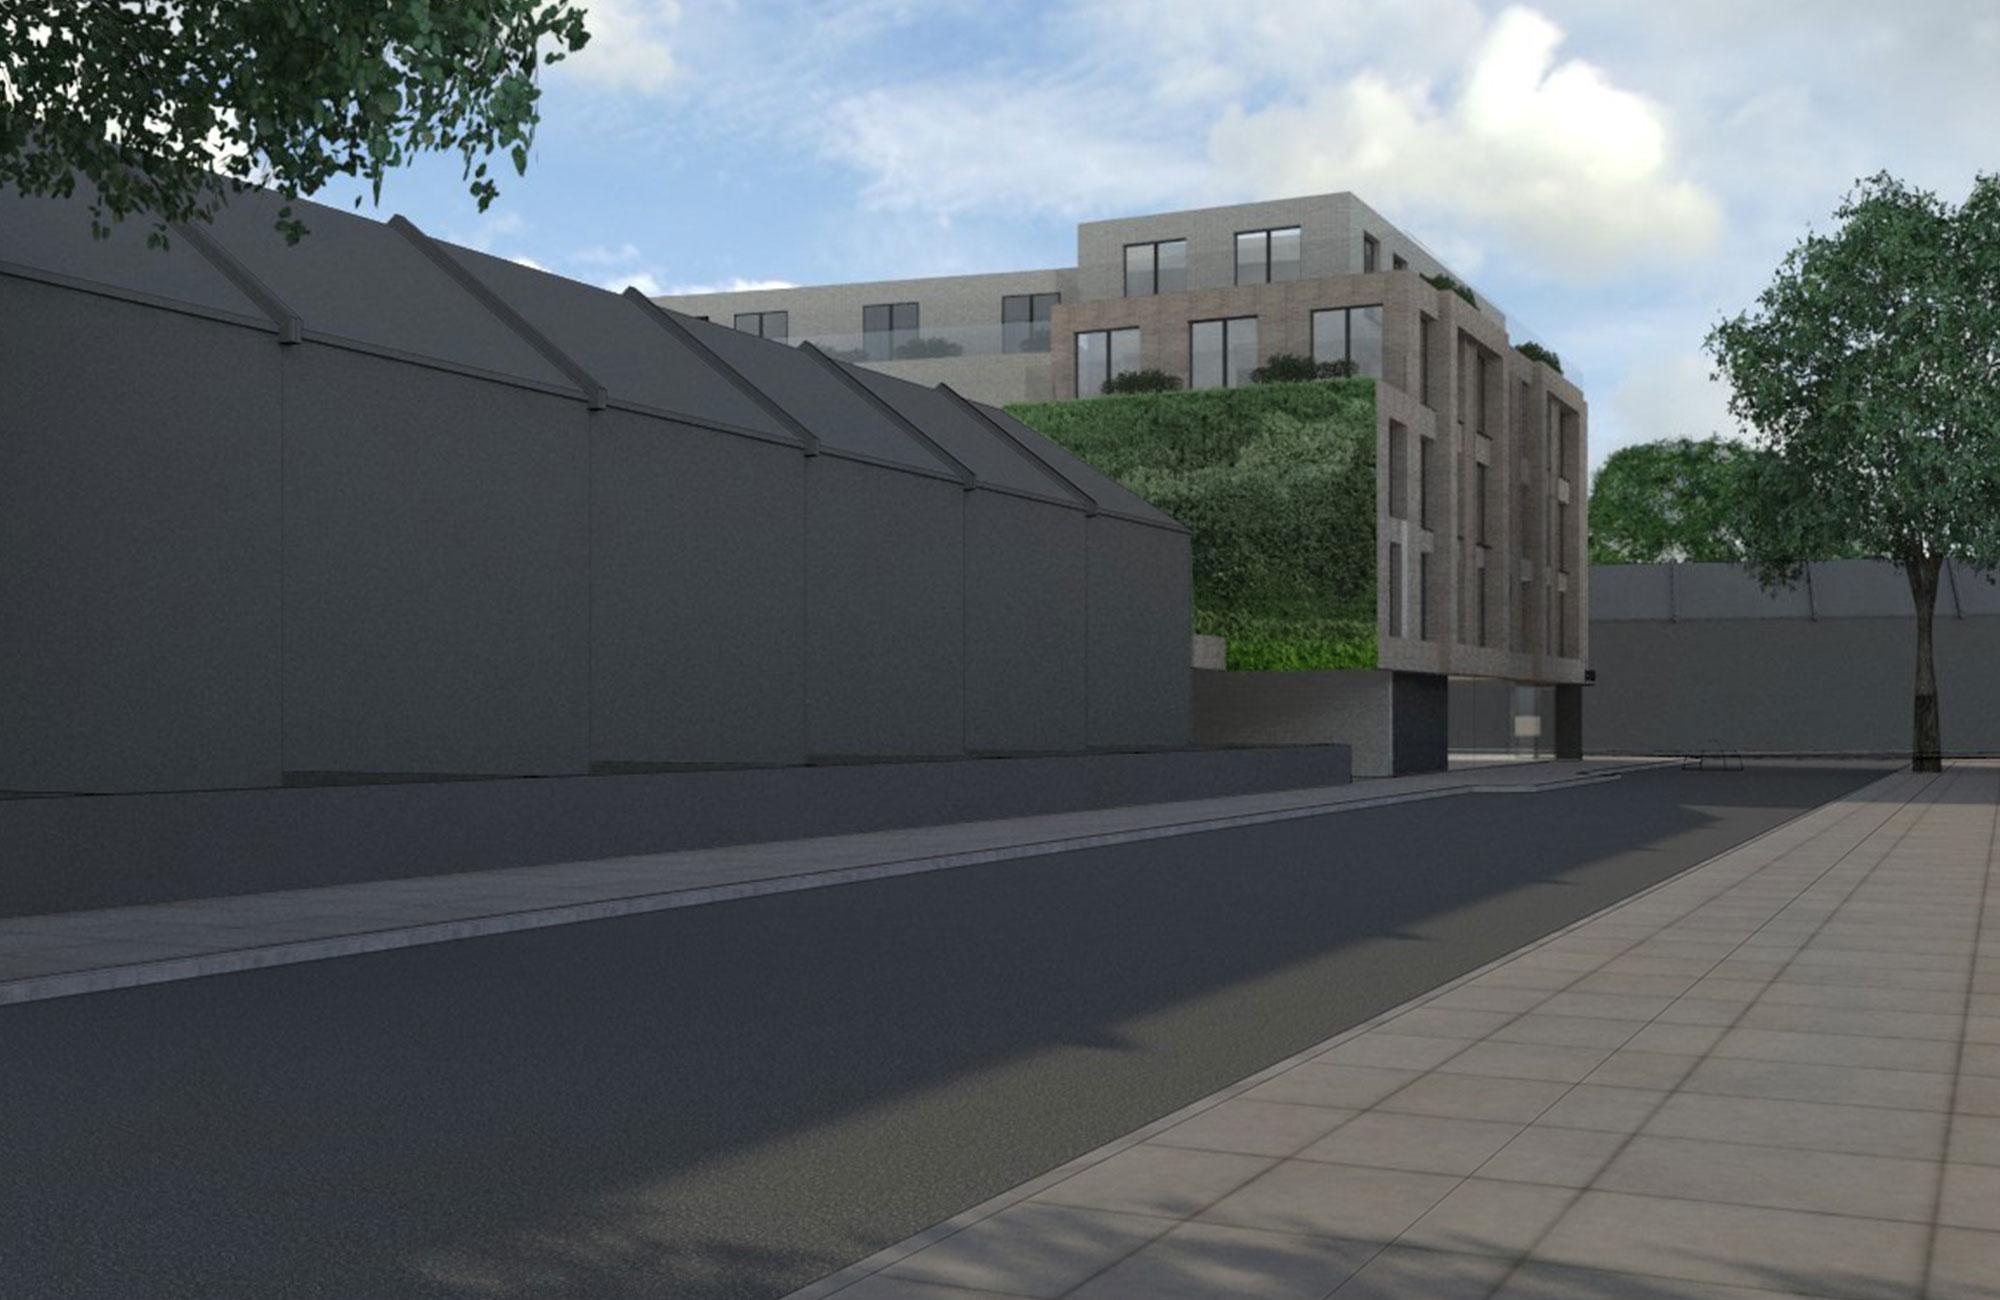 00 City Development coupdeville second 1